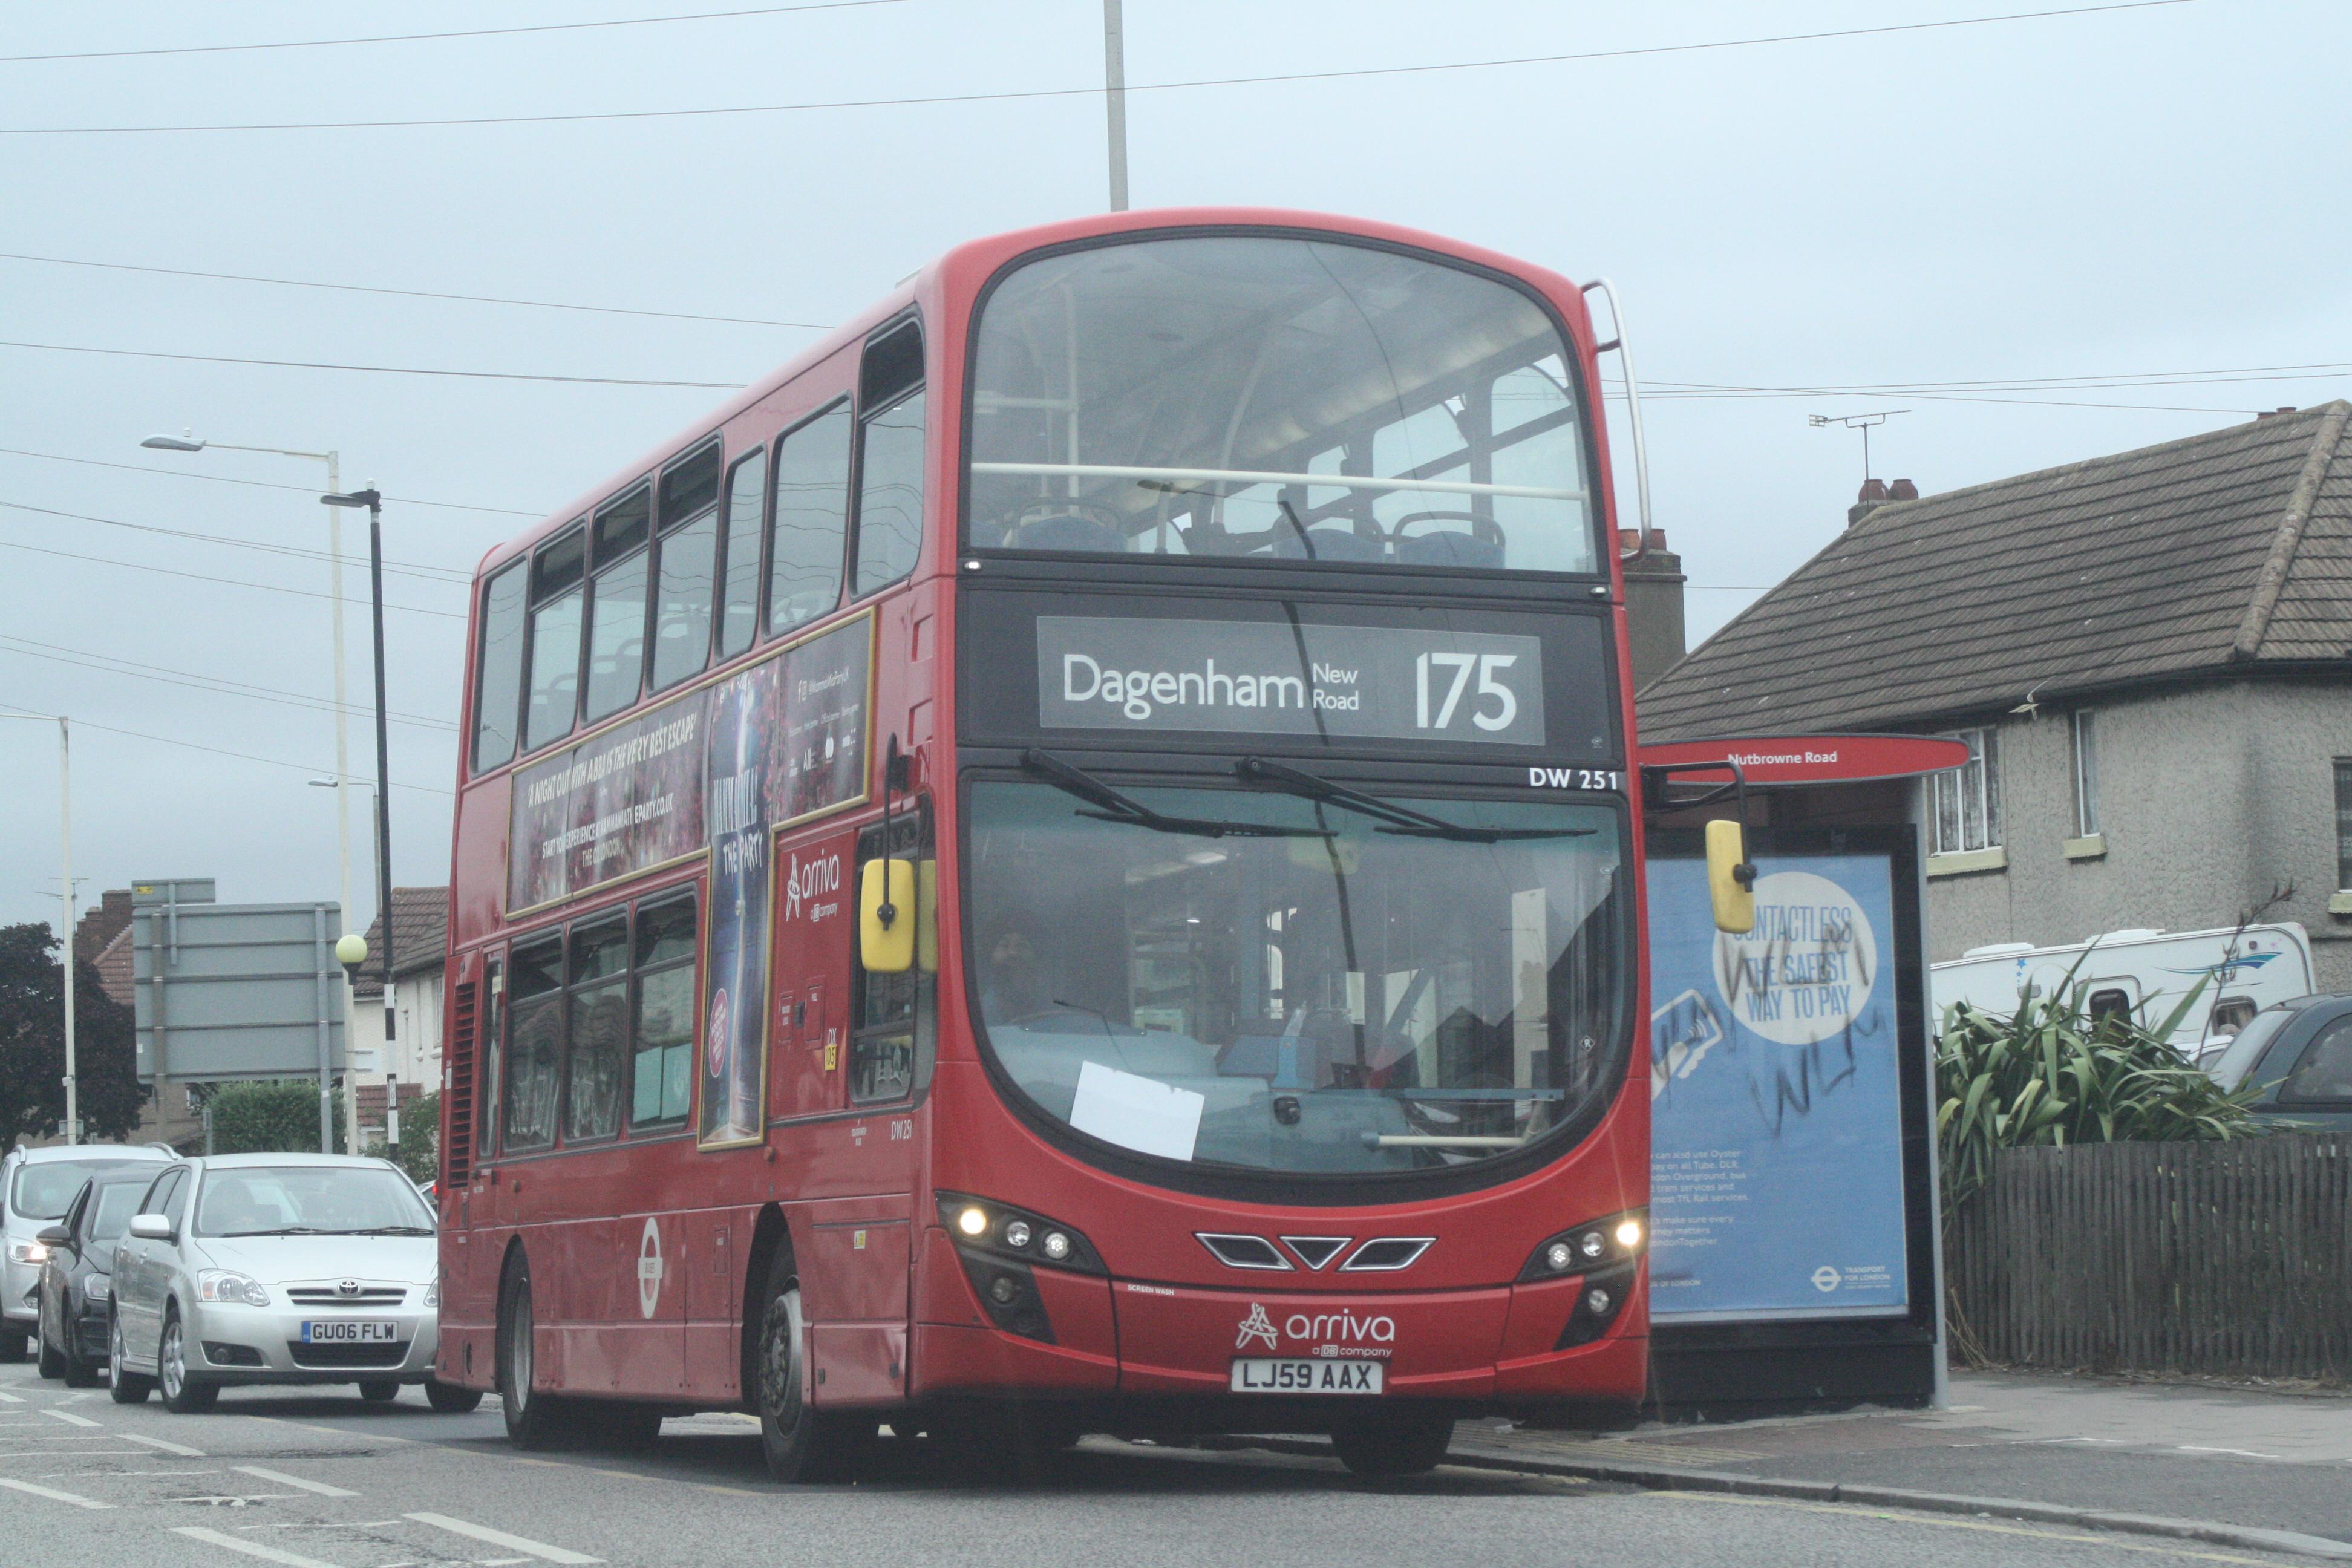 LJ59AAX DW251 AR LONDON N 175 (HEATHWAY) 4-7-20